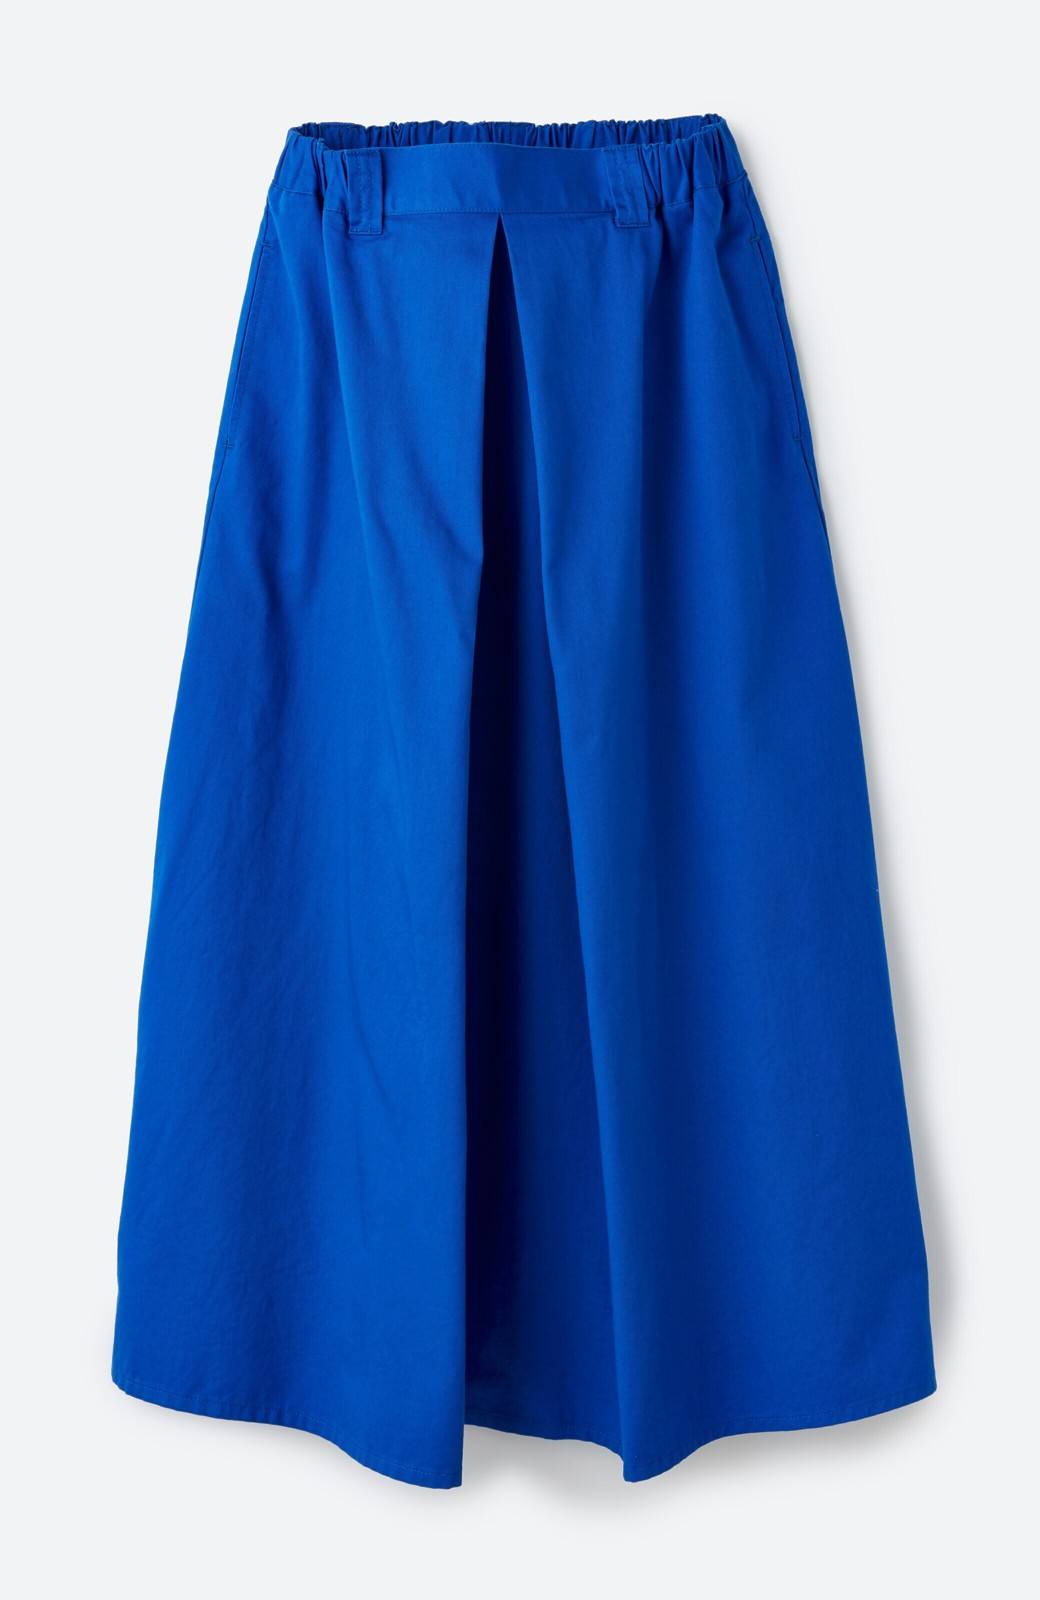 haco! 【今年も再販!】ロングシーズン楽しめる タックボリュームのチノロングスカート <ブルー>の商品写真2